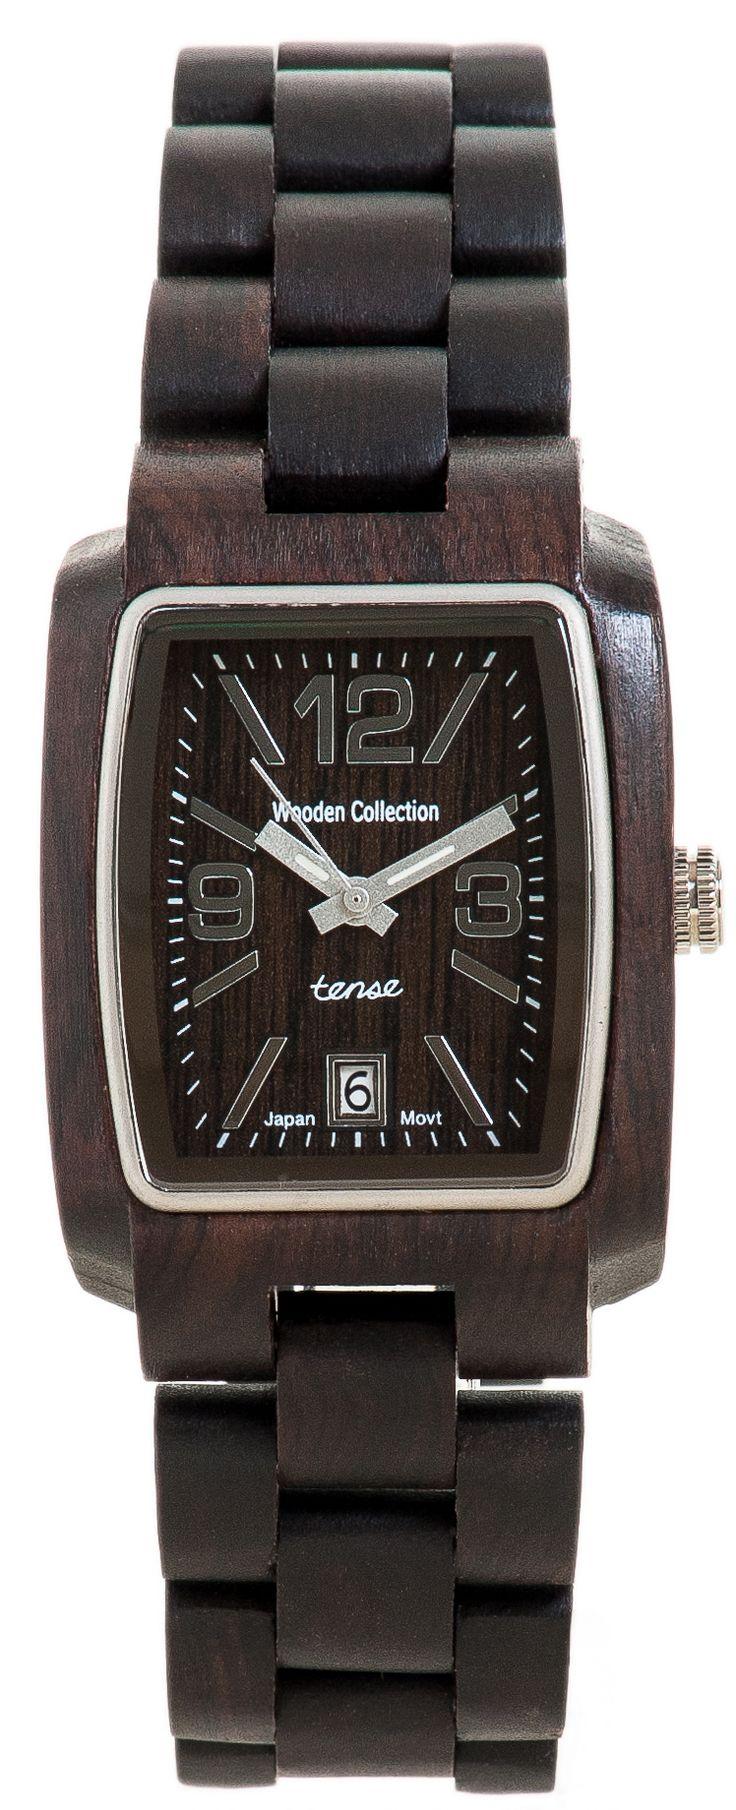 Tense Men's Timber Watch in Dark Sandalwood - $139 at tensewatch.com.